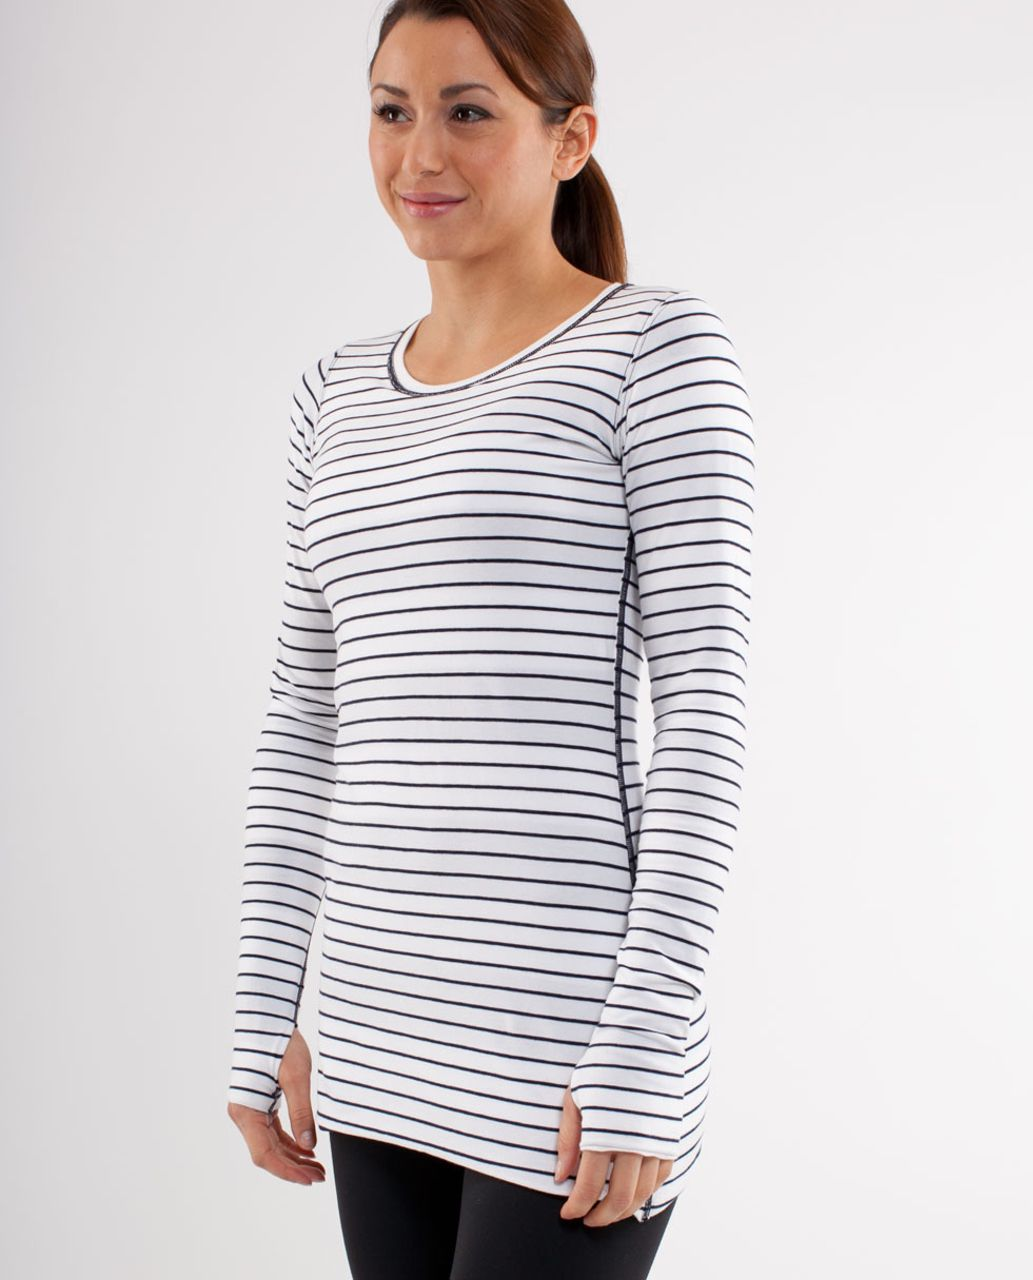 Lululemon Every Yogi Long Sleeve - Wide Bold Stripe White Deep Indigo /  Quiet Stripe White Deep Indigo